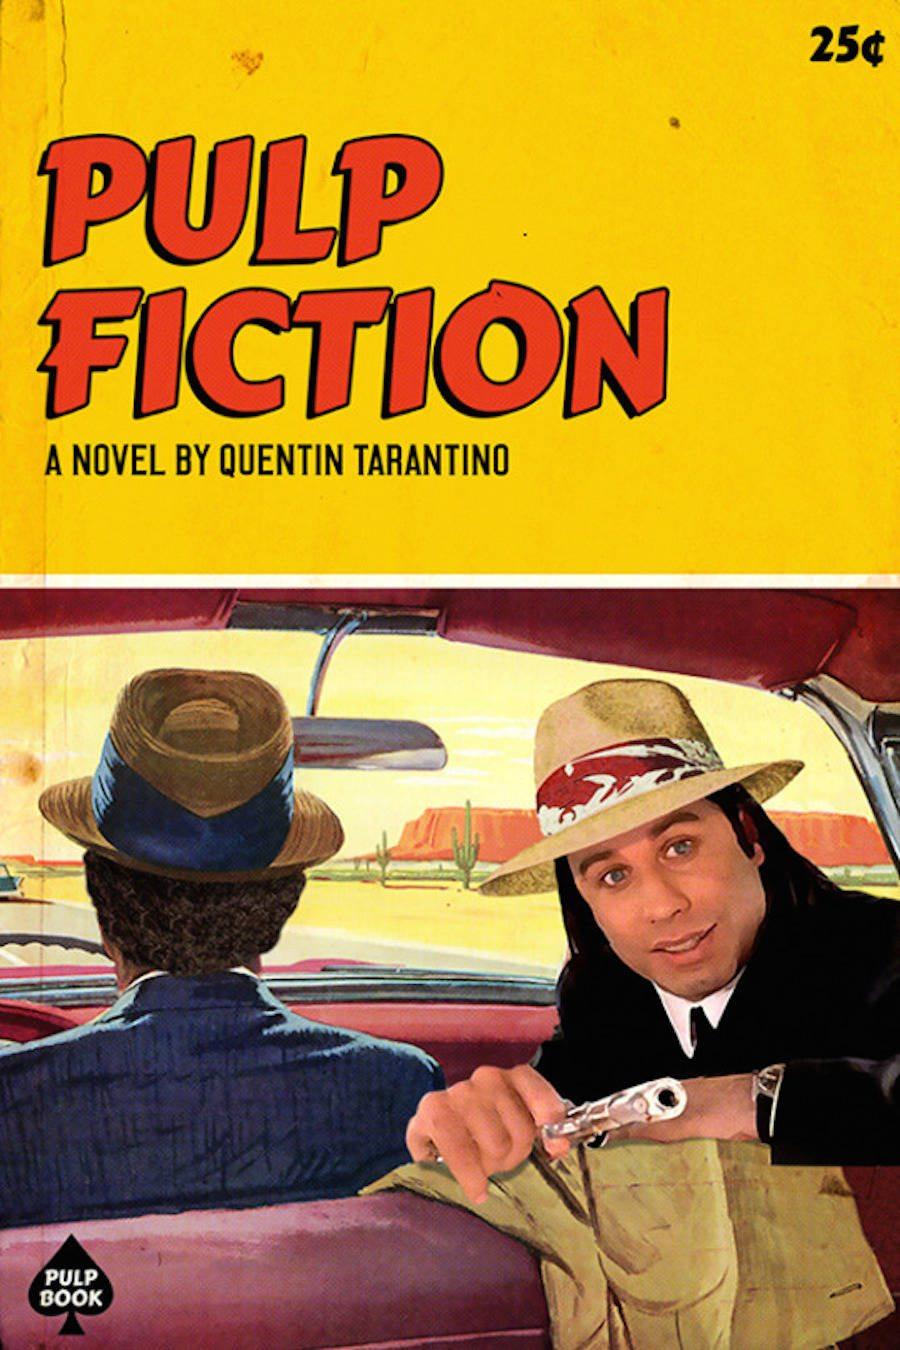 Tarantino filmleri Pulp Books'la buluştu